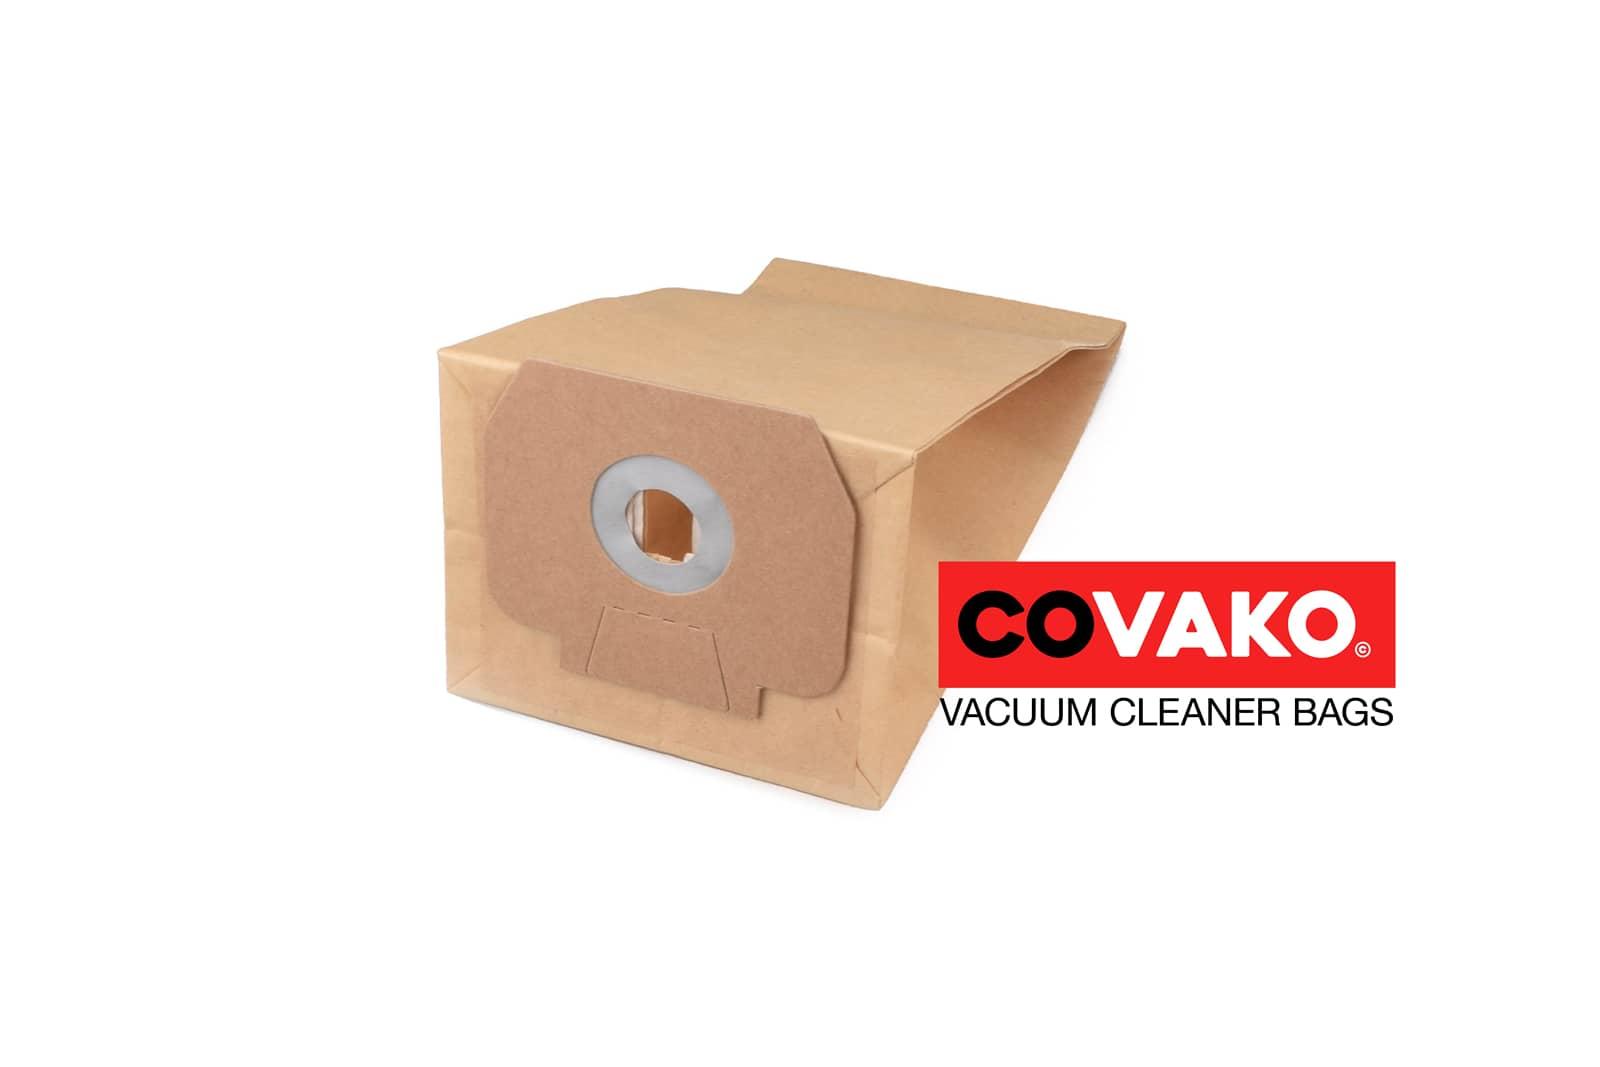 Columbus RS 27 / Paper - Columbus vacuum cleaner bags